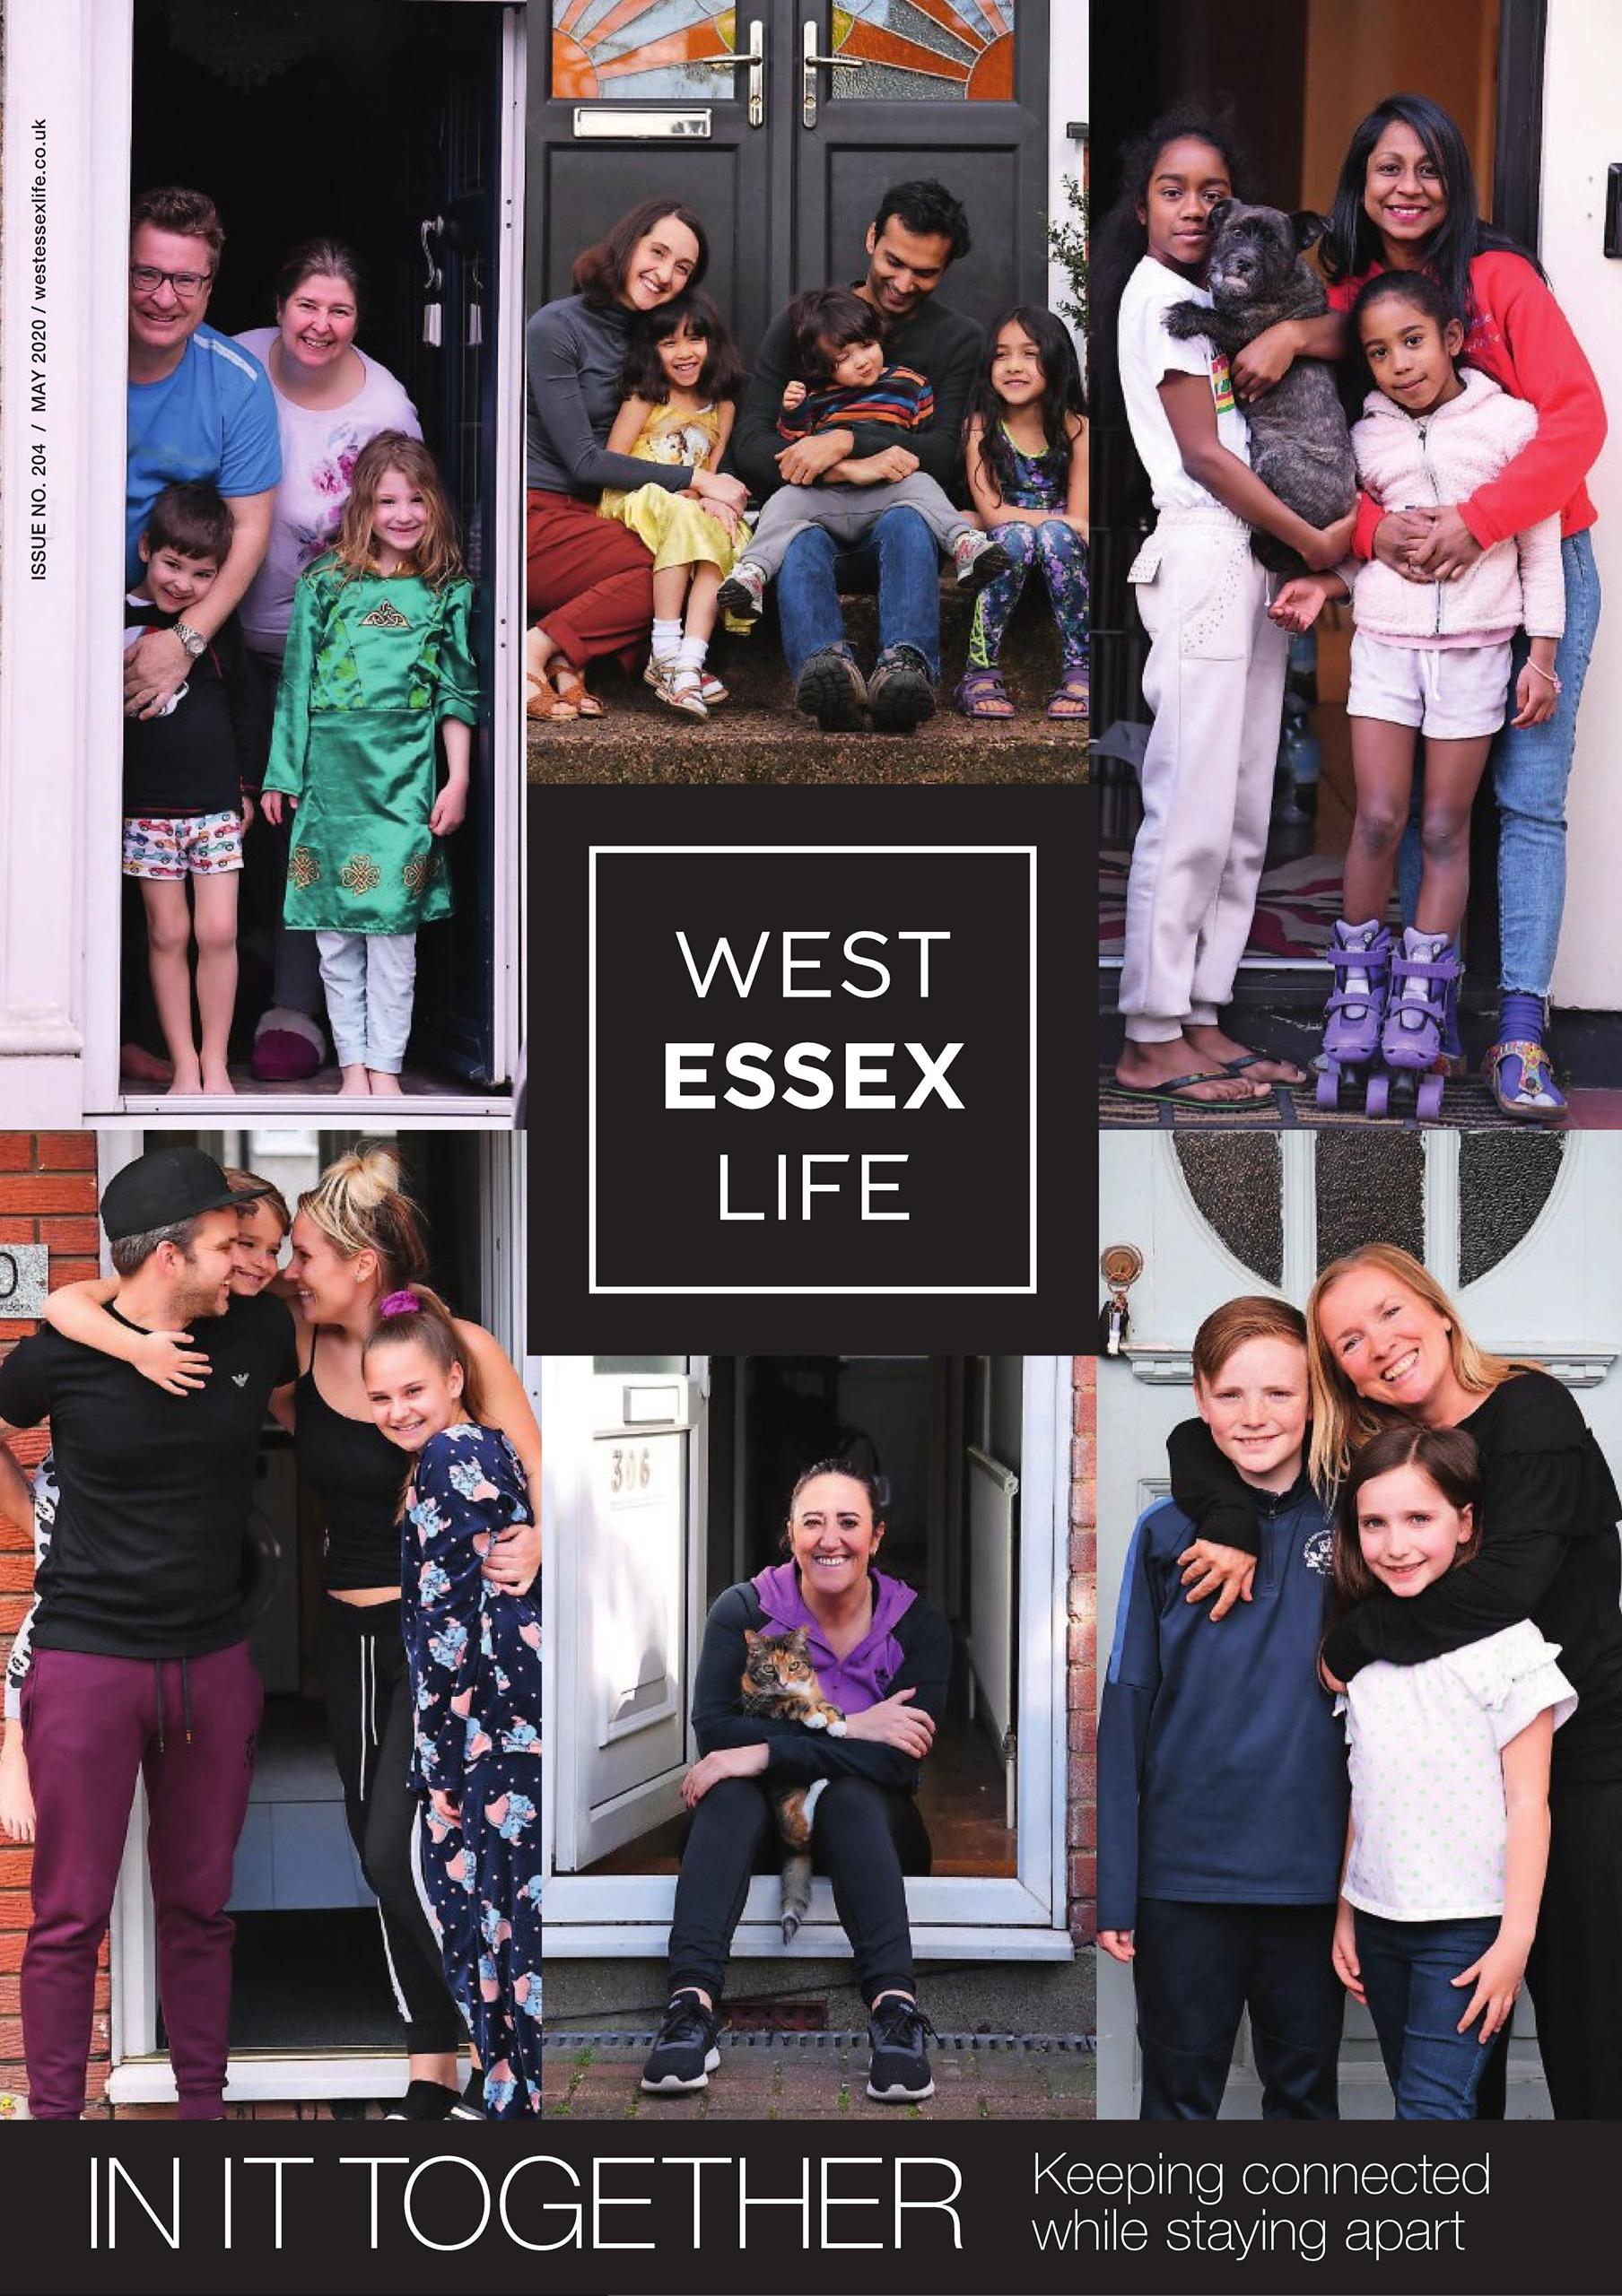 West Essex Life Front